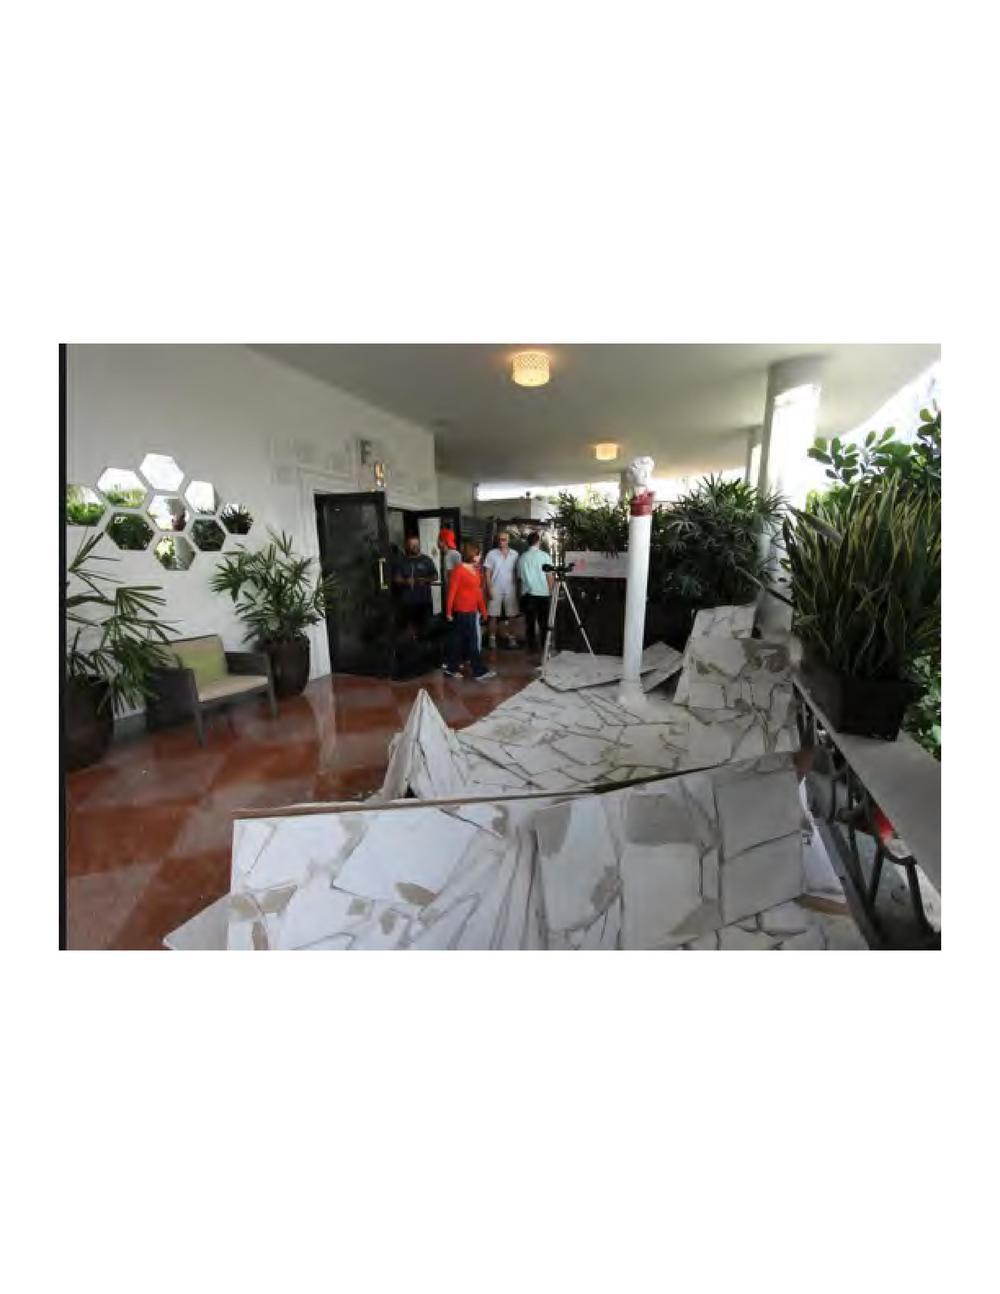 Miami_Art_Basel_Photographs-web-page-082.jpg